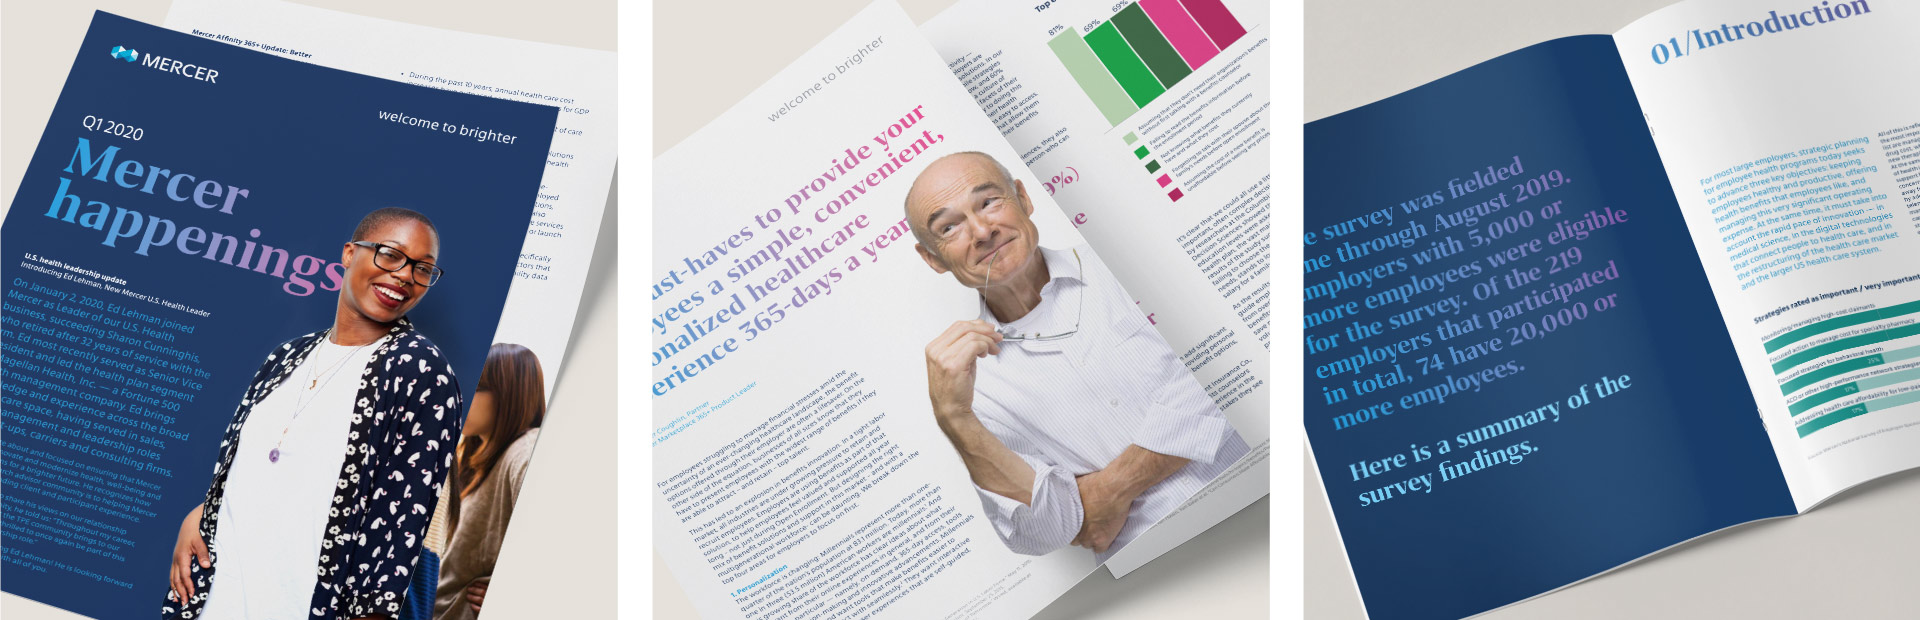 Mercer Health - Print Marketing by Springer Studios, Raleigh, NC